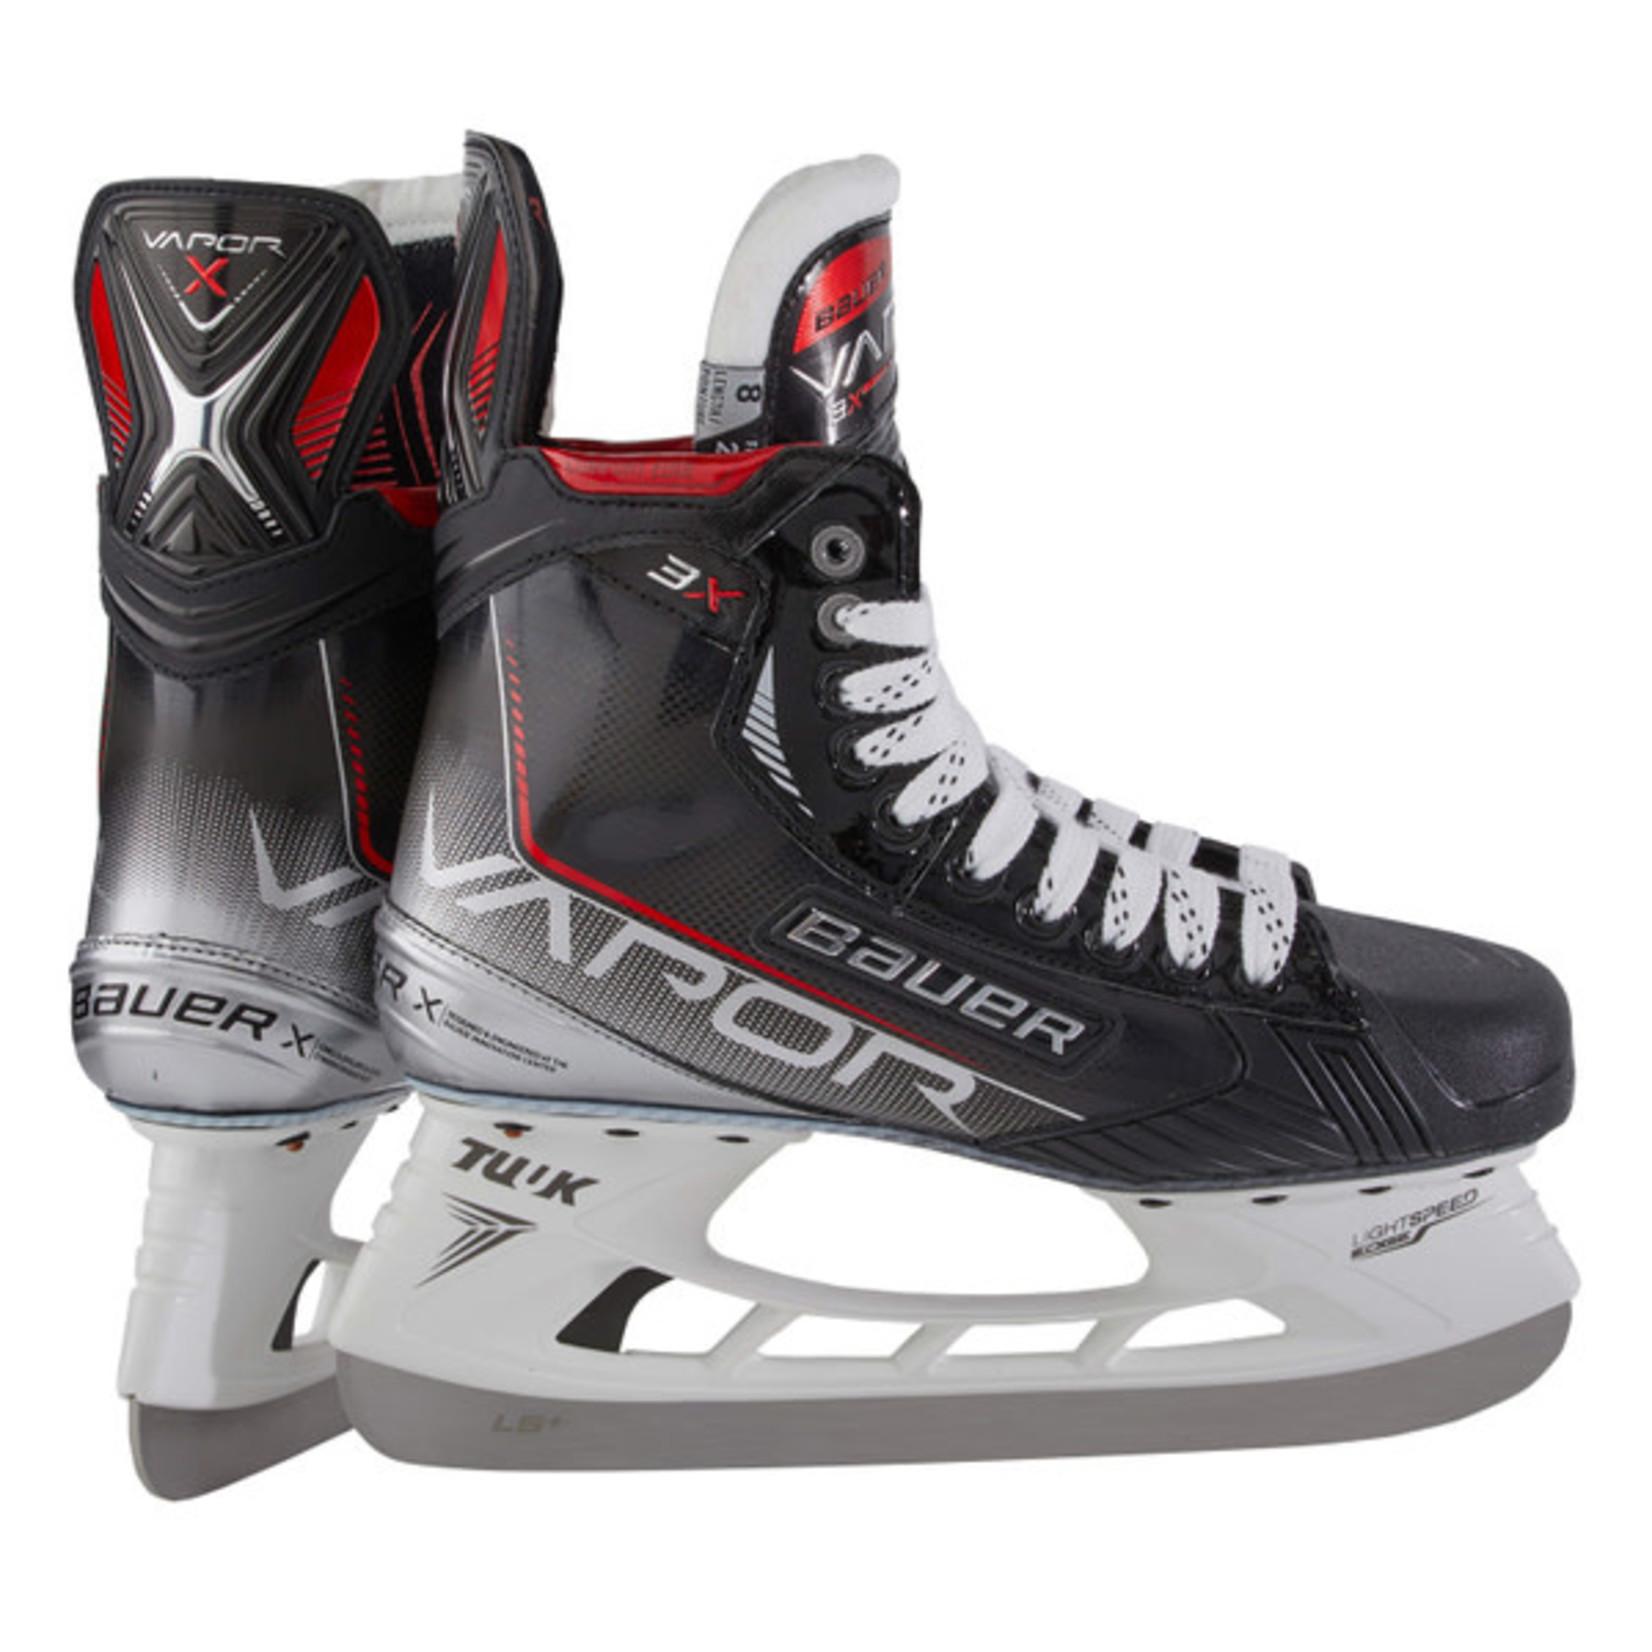 Bauer Bauer Hockey Skates, Vapor 3X, Intermediate